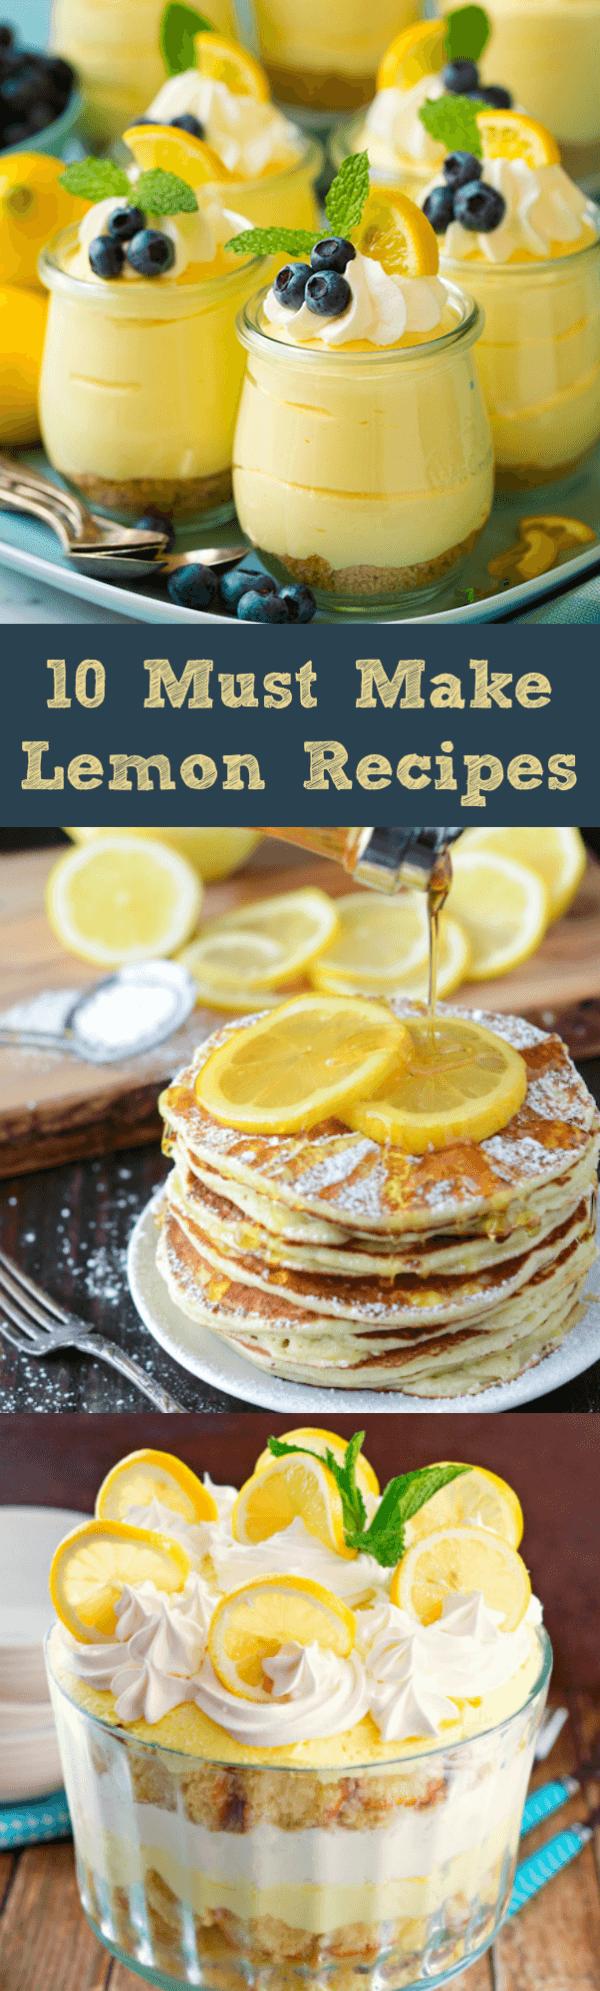 Lemon Pancakes, Lemon Sorbet and an Outrageous Lemon Trifle